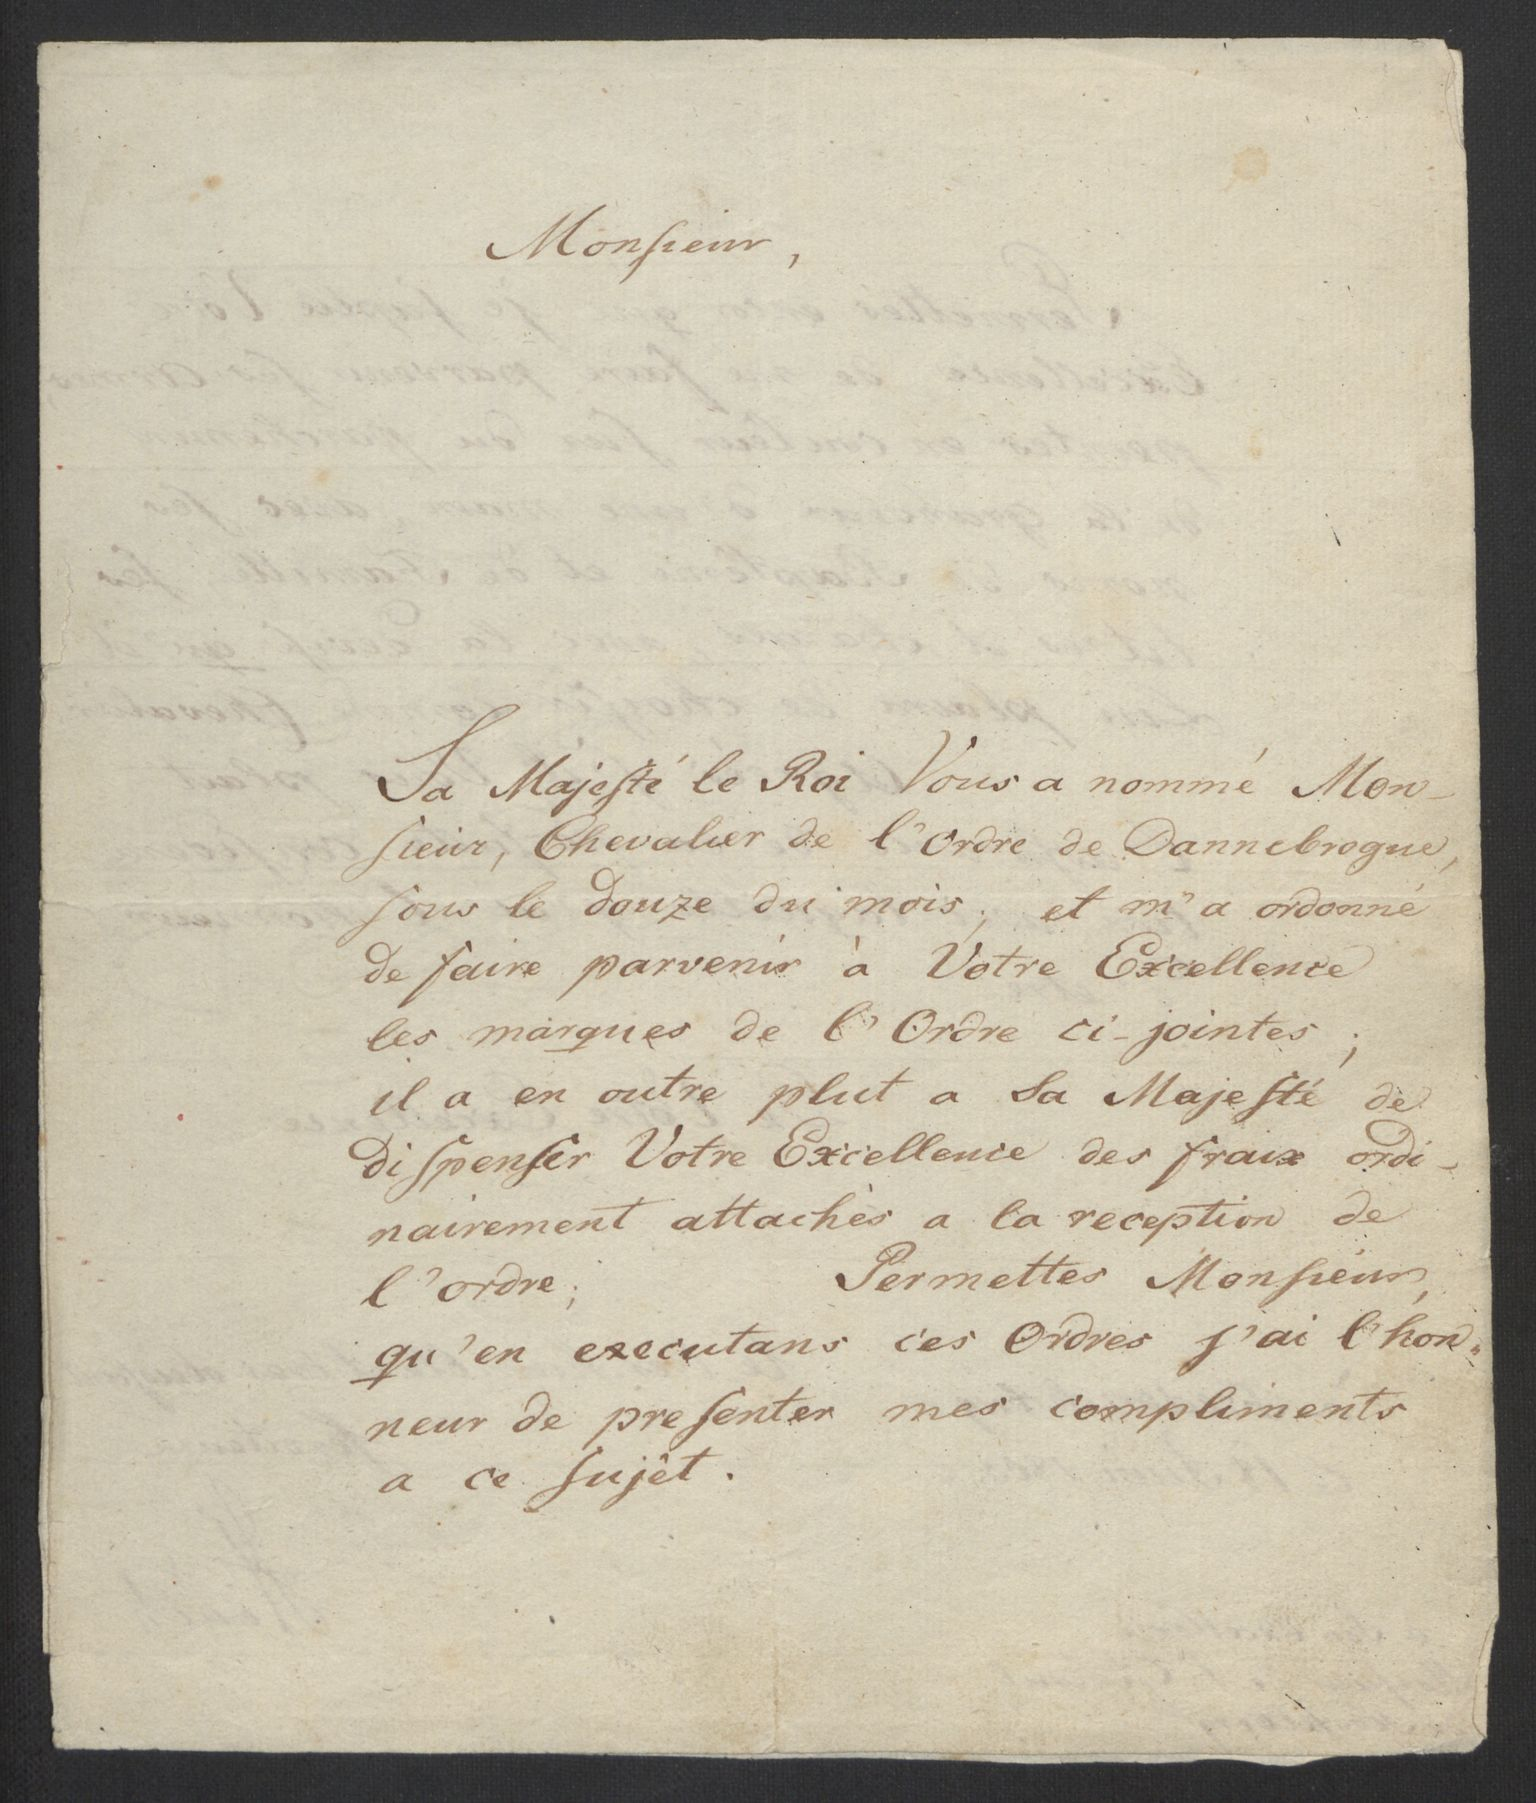 RA, Hesselberg, Hans Jacob Henning, F/L0001: --, 1759-1809, s. 88